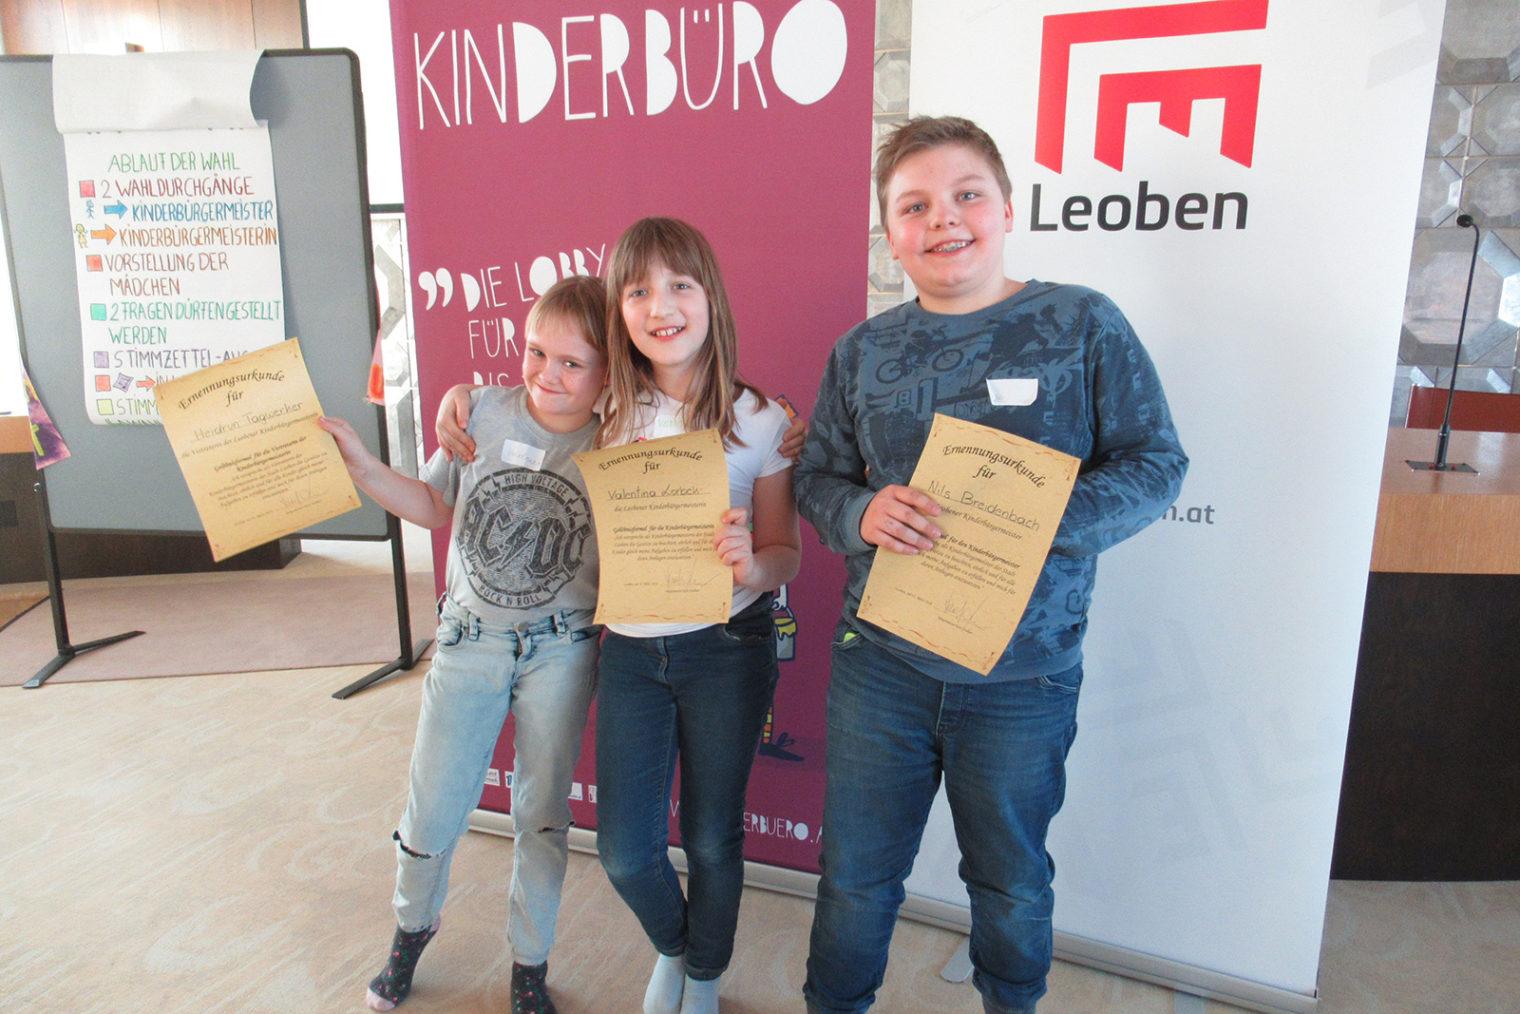 Gruppenbild Kinderbürgermeister Leoben 2019